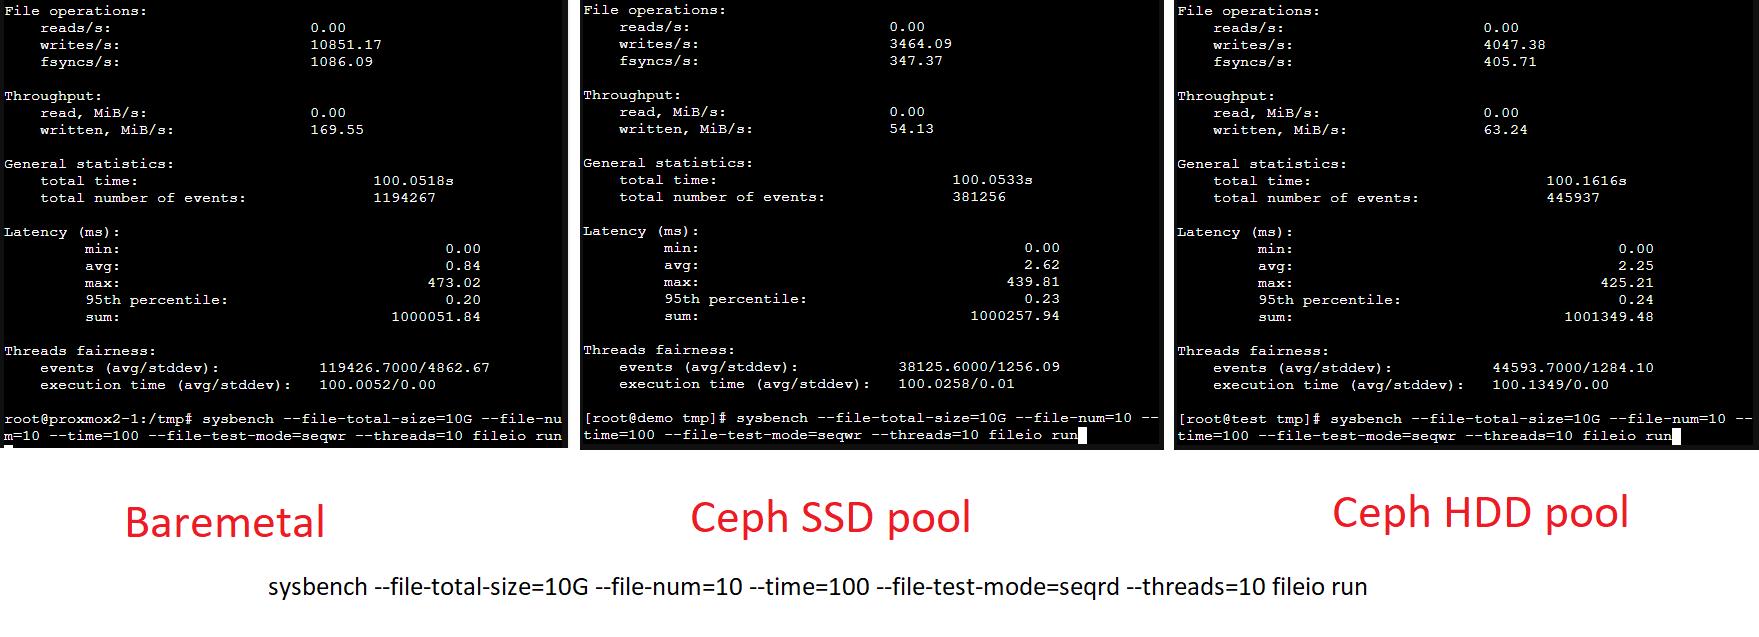 proxmox-benchmark-baremetal-ceph_ssd-ceph_hdd_seqwr_q10_nodirect.png